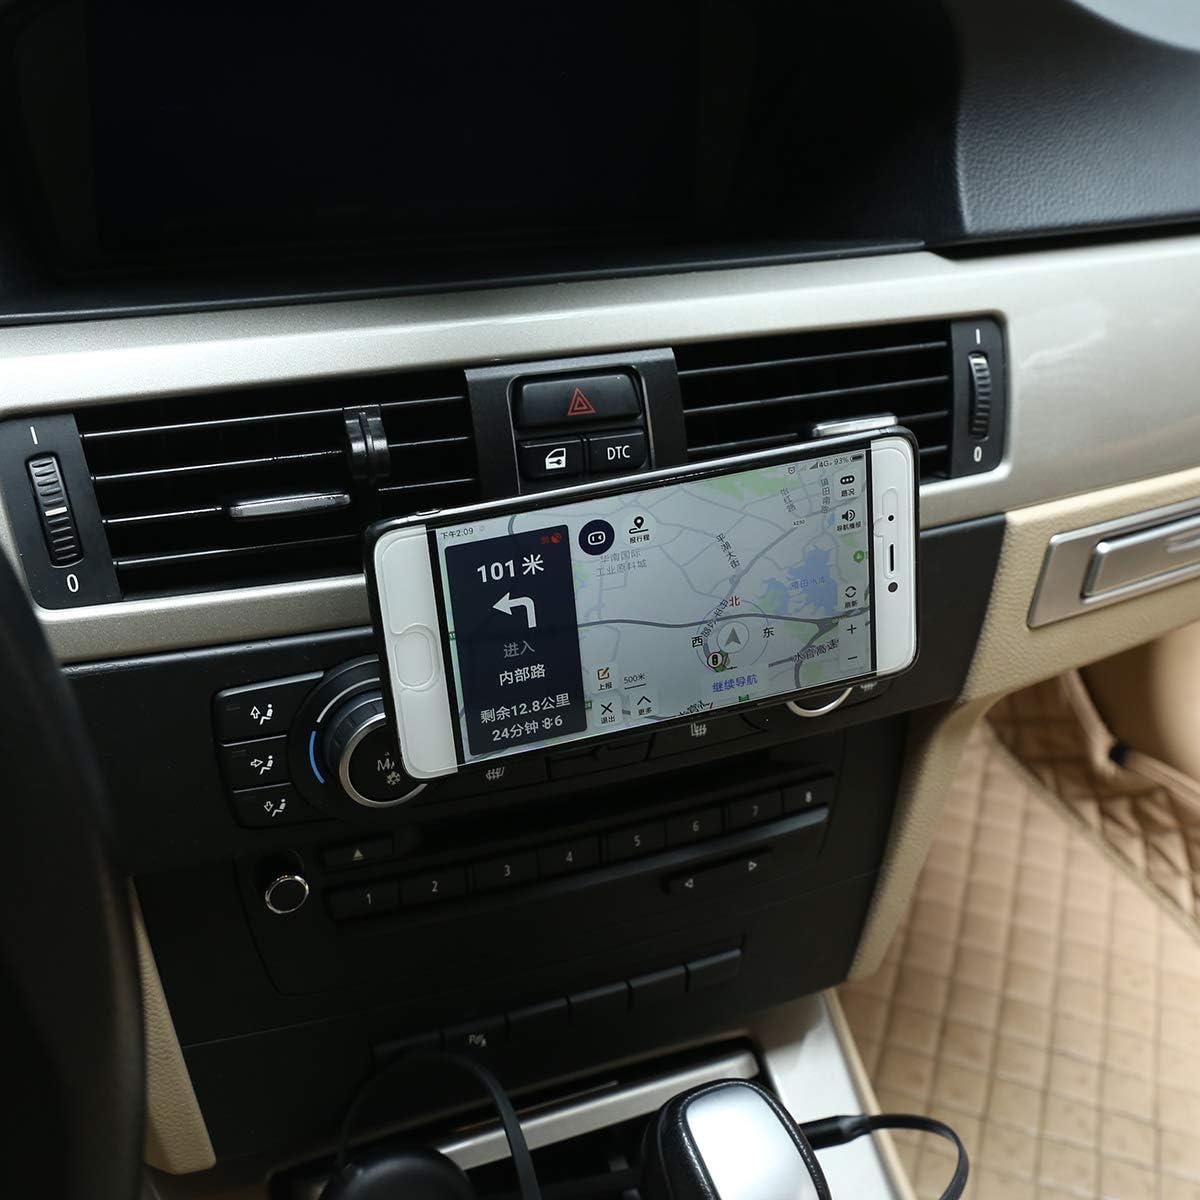 CHEYA Aluminum Alloy Car Center Console Air Vent Mobile Phone Holder for BMW 3 Series E90 E92 2005-2012 Car Accessories Black